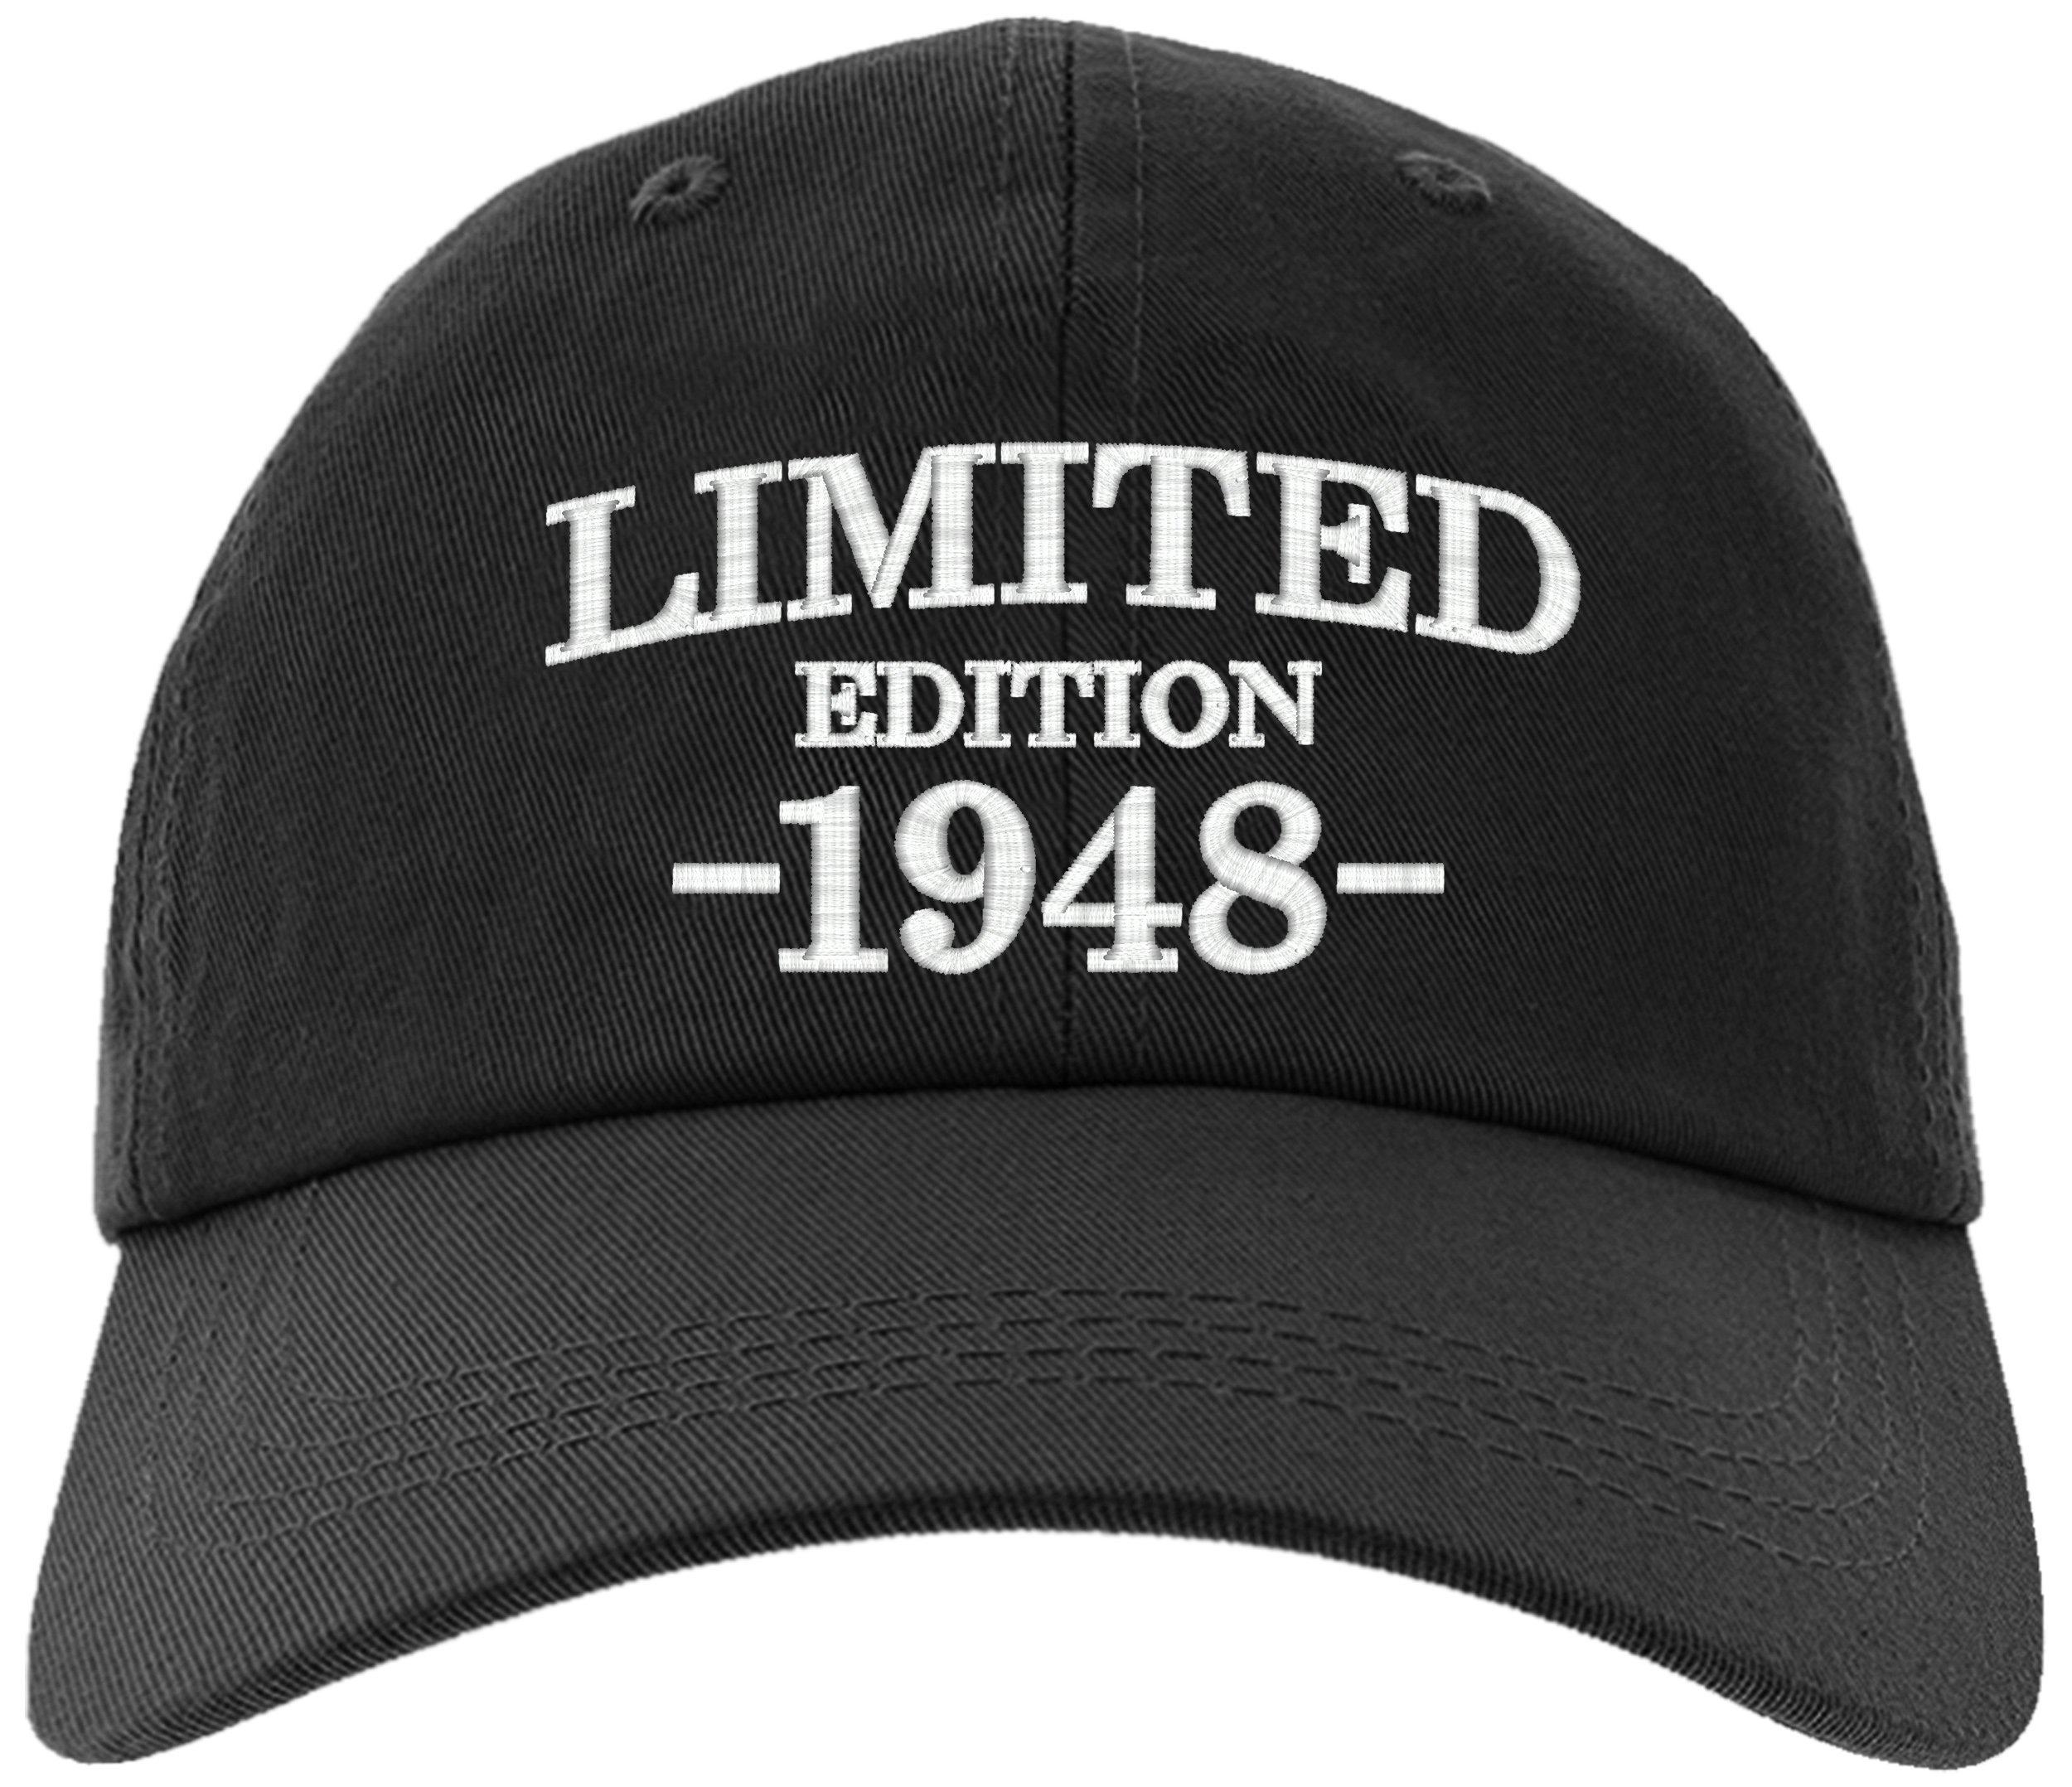 owndis Cap 1948-70th Birthday Gift, Limited Edition 1948 All Original Parts Baseball Hat 1948-EM-0002-Black